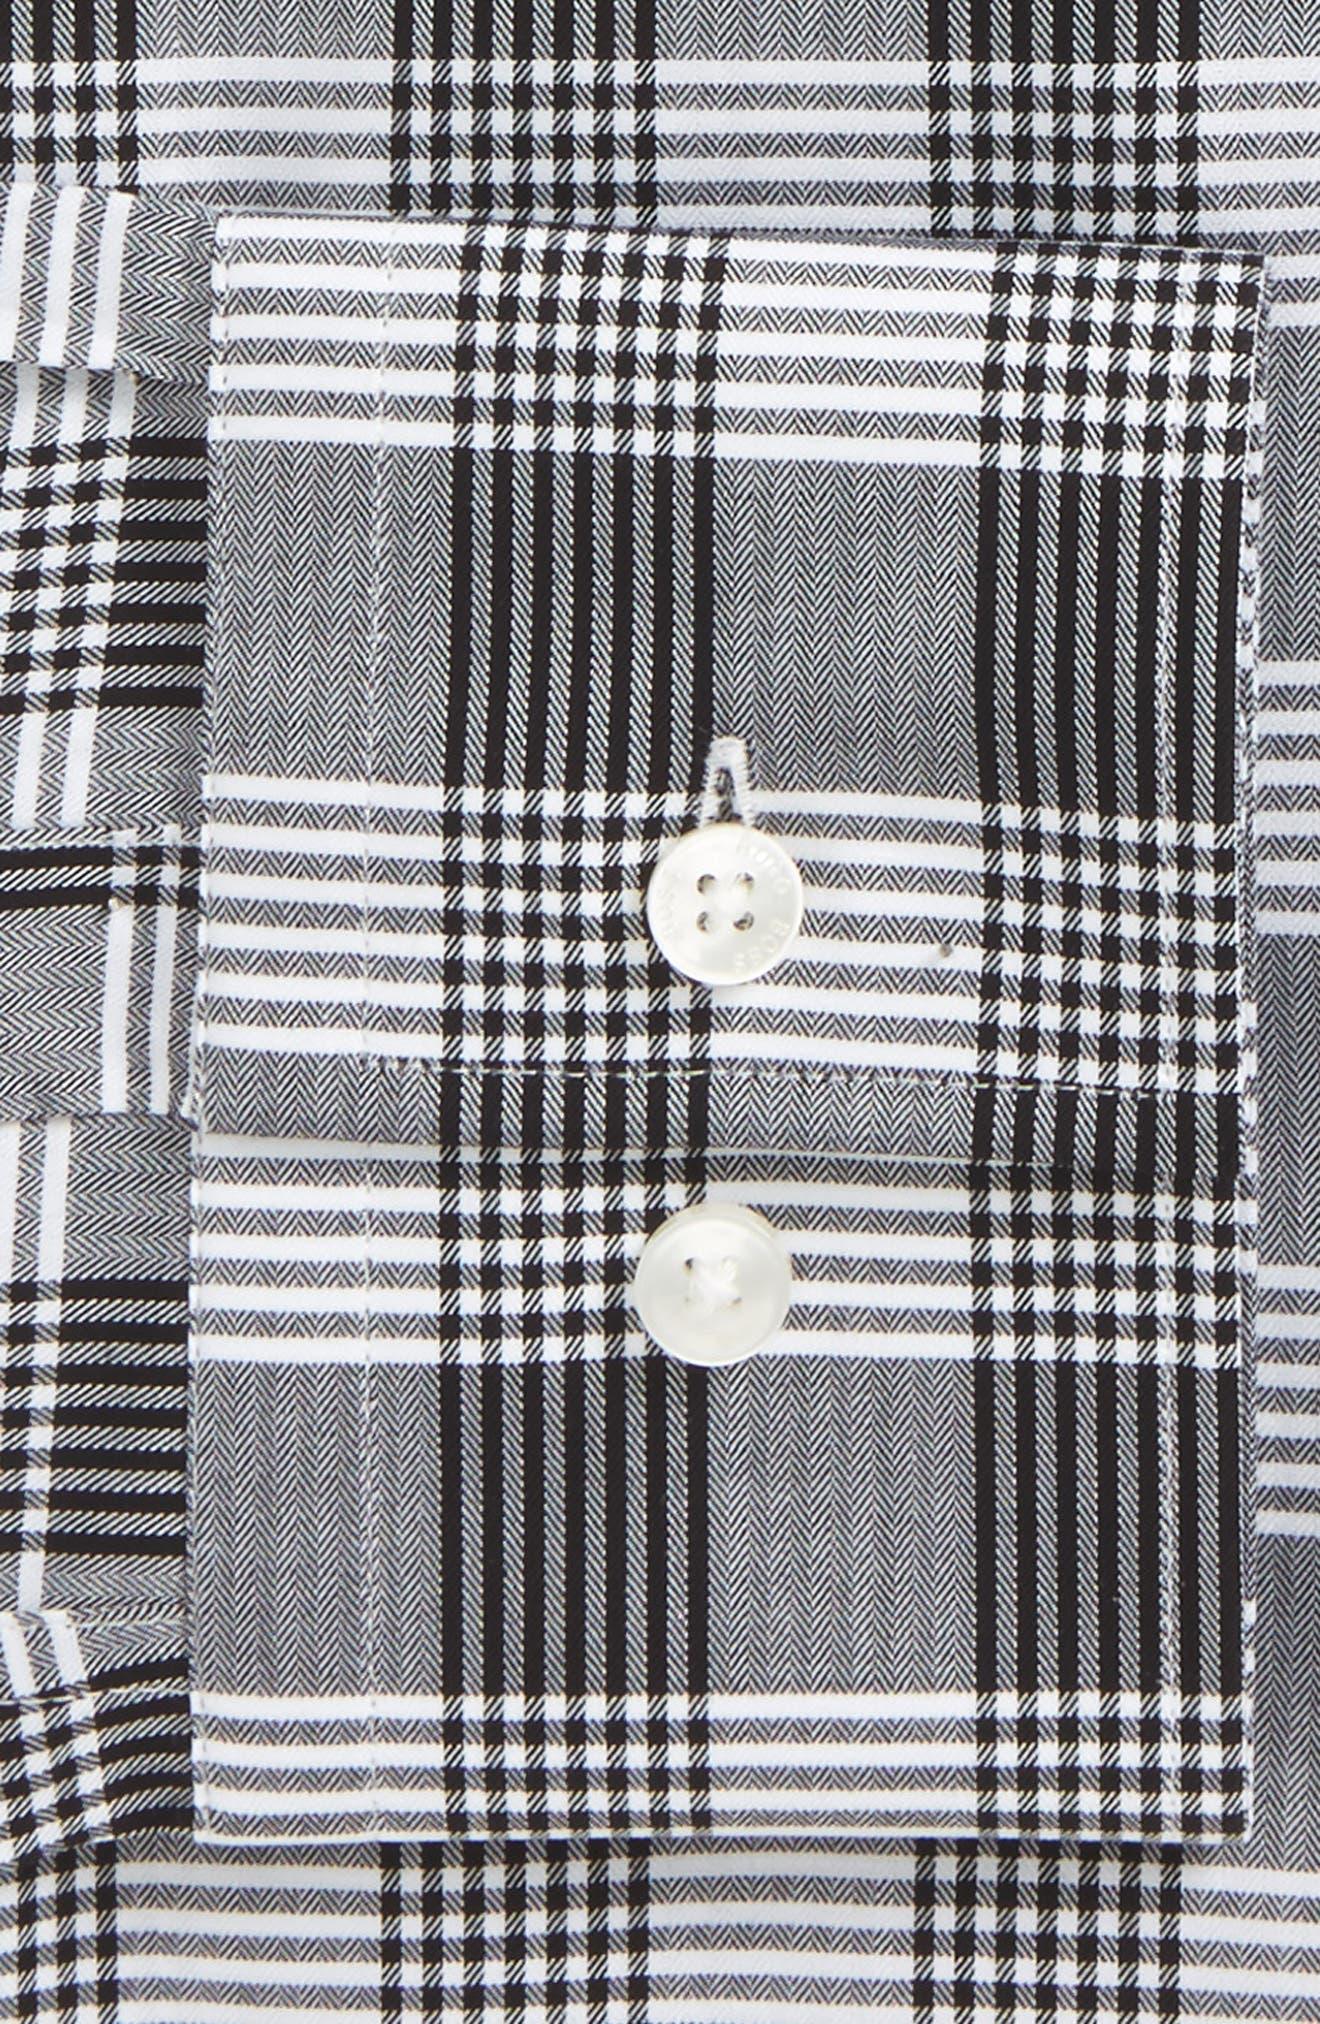 Jason Slim Fit Plaid Dress Shirt,                             Alternate thumbnail 2, color,                             020